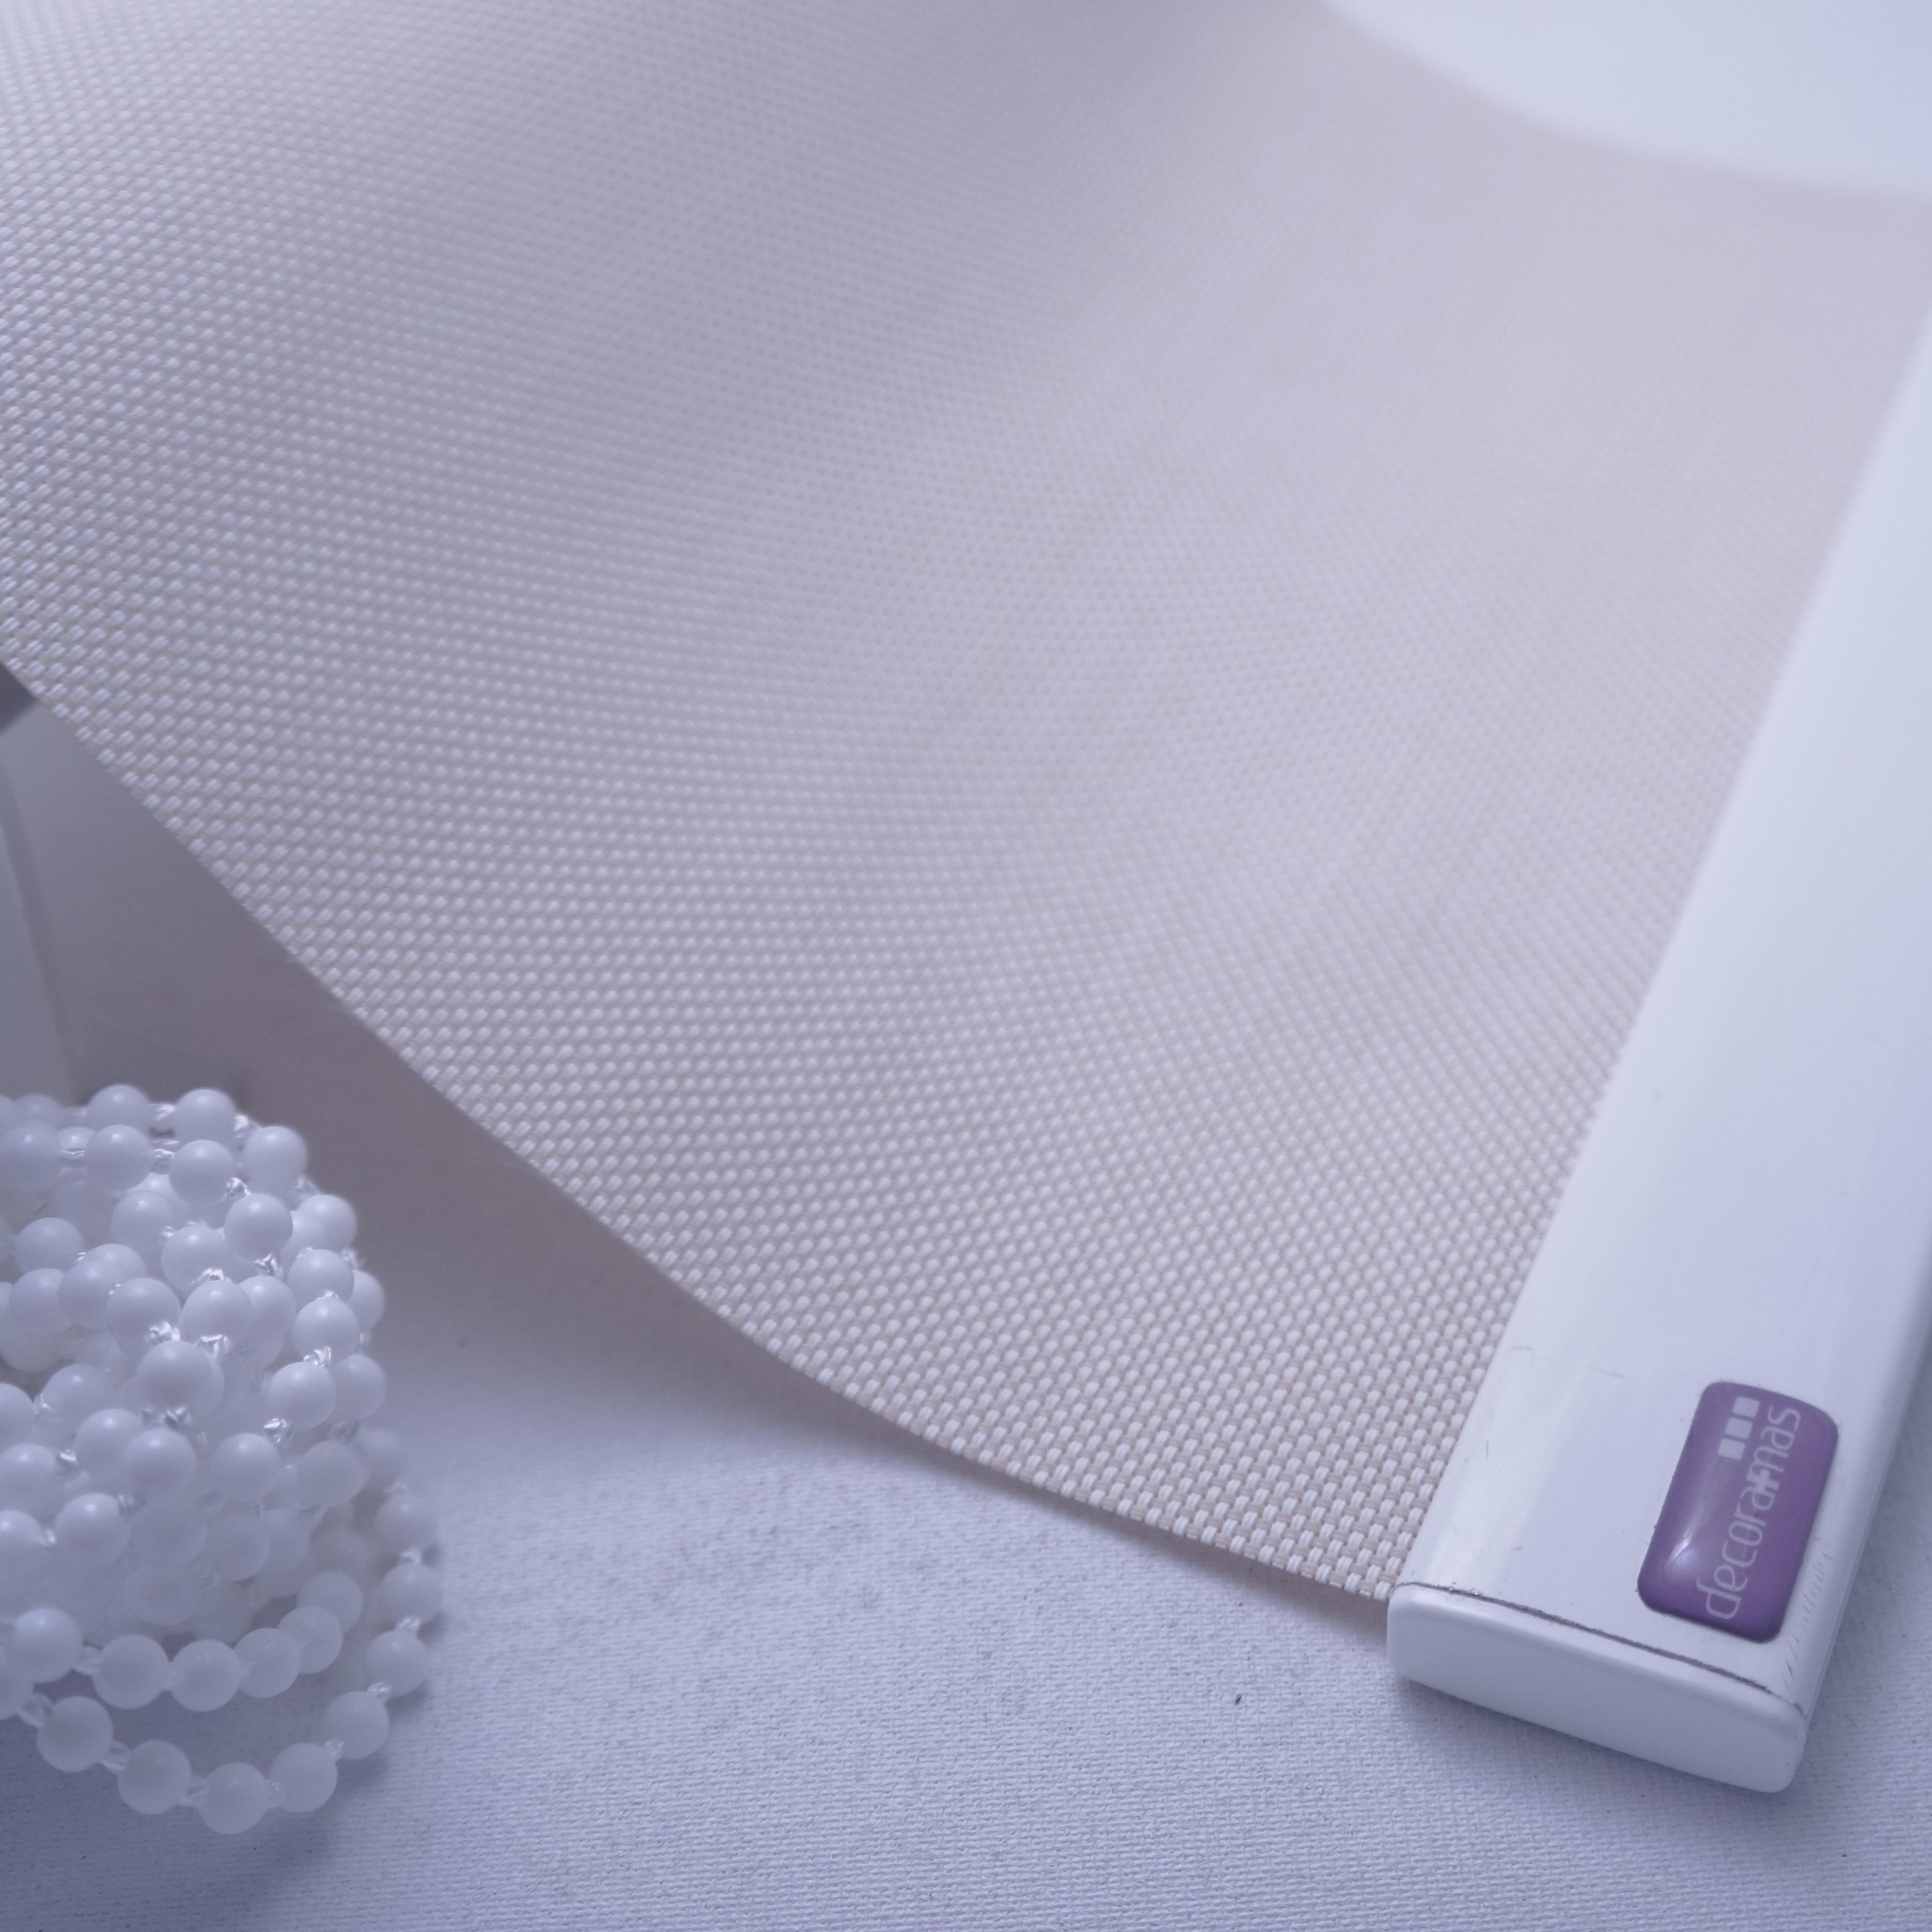 Cortina Roller Sunscreen New Crema